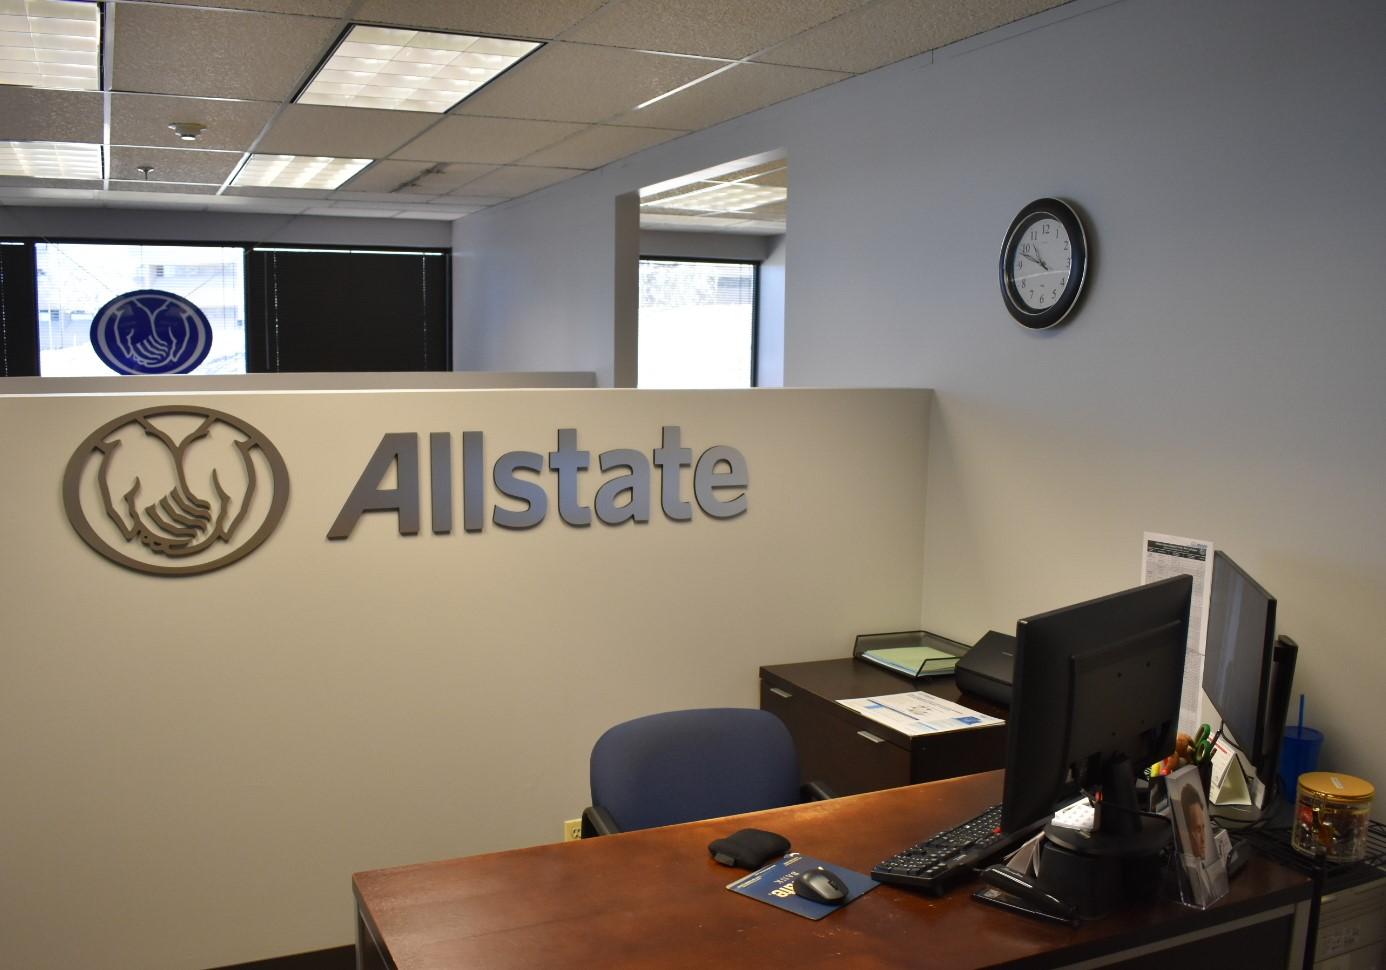 Gary Chitwood: Allstate Insurance image 3